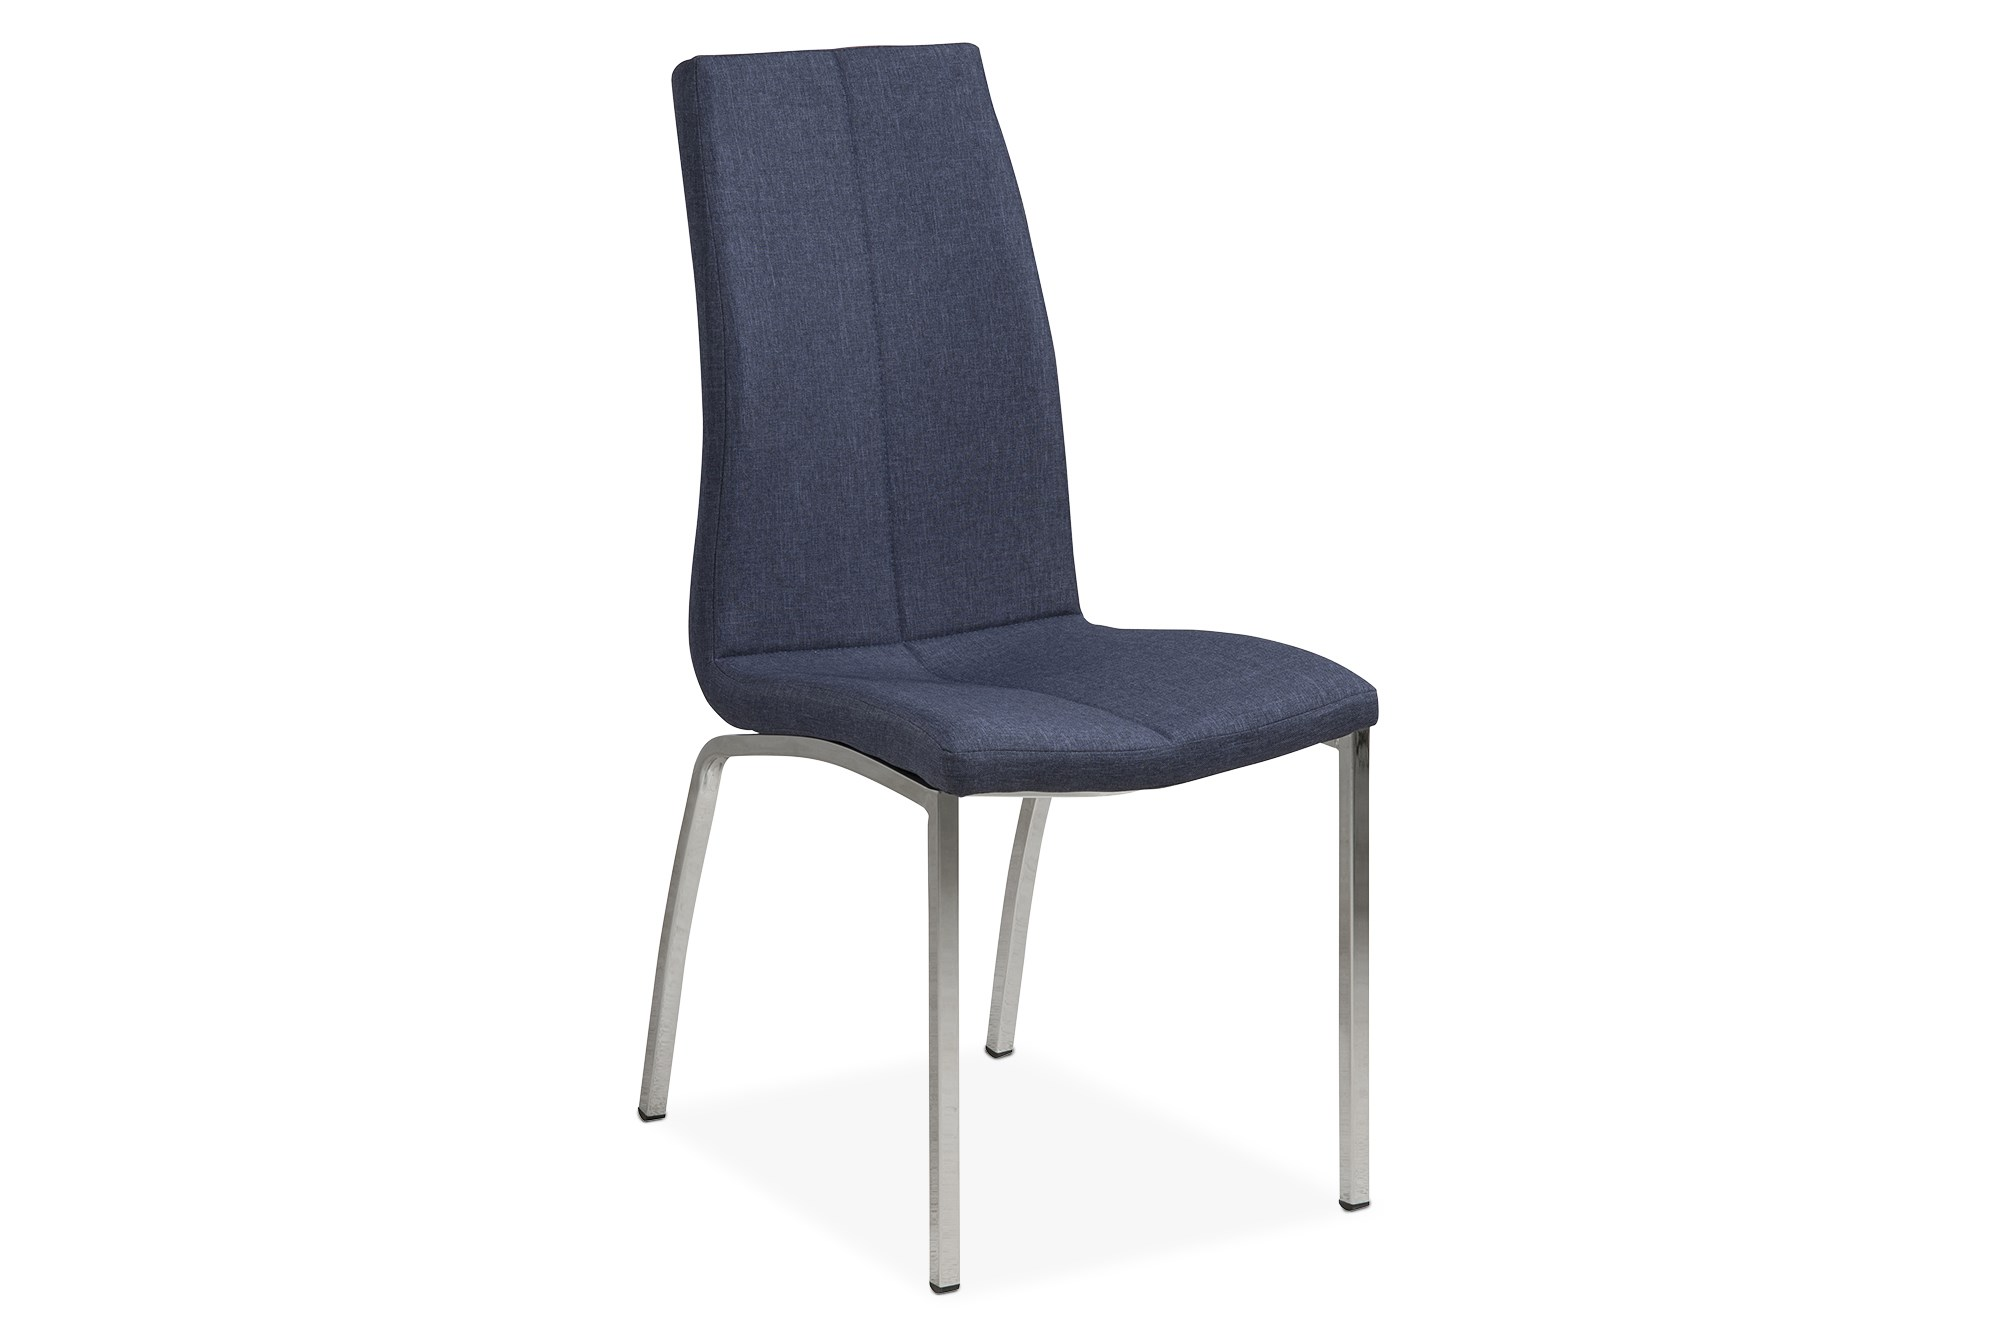 Alina Spisebordsstol, Mørkeblå M. Krom Stel